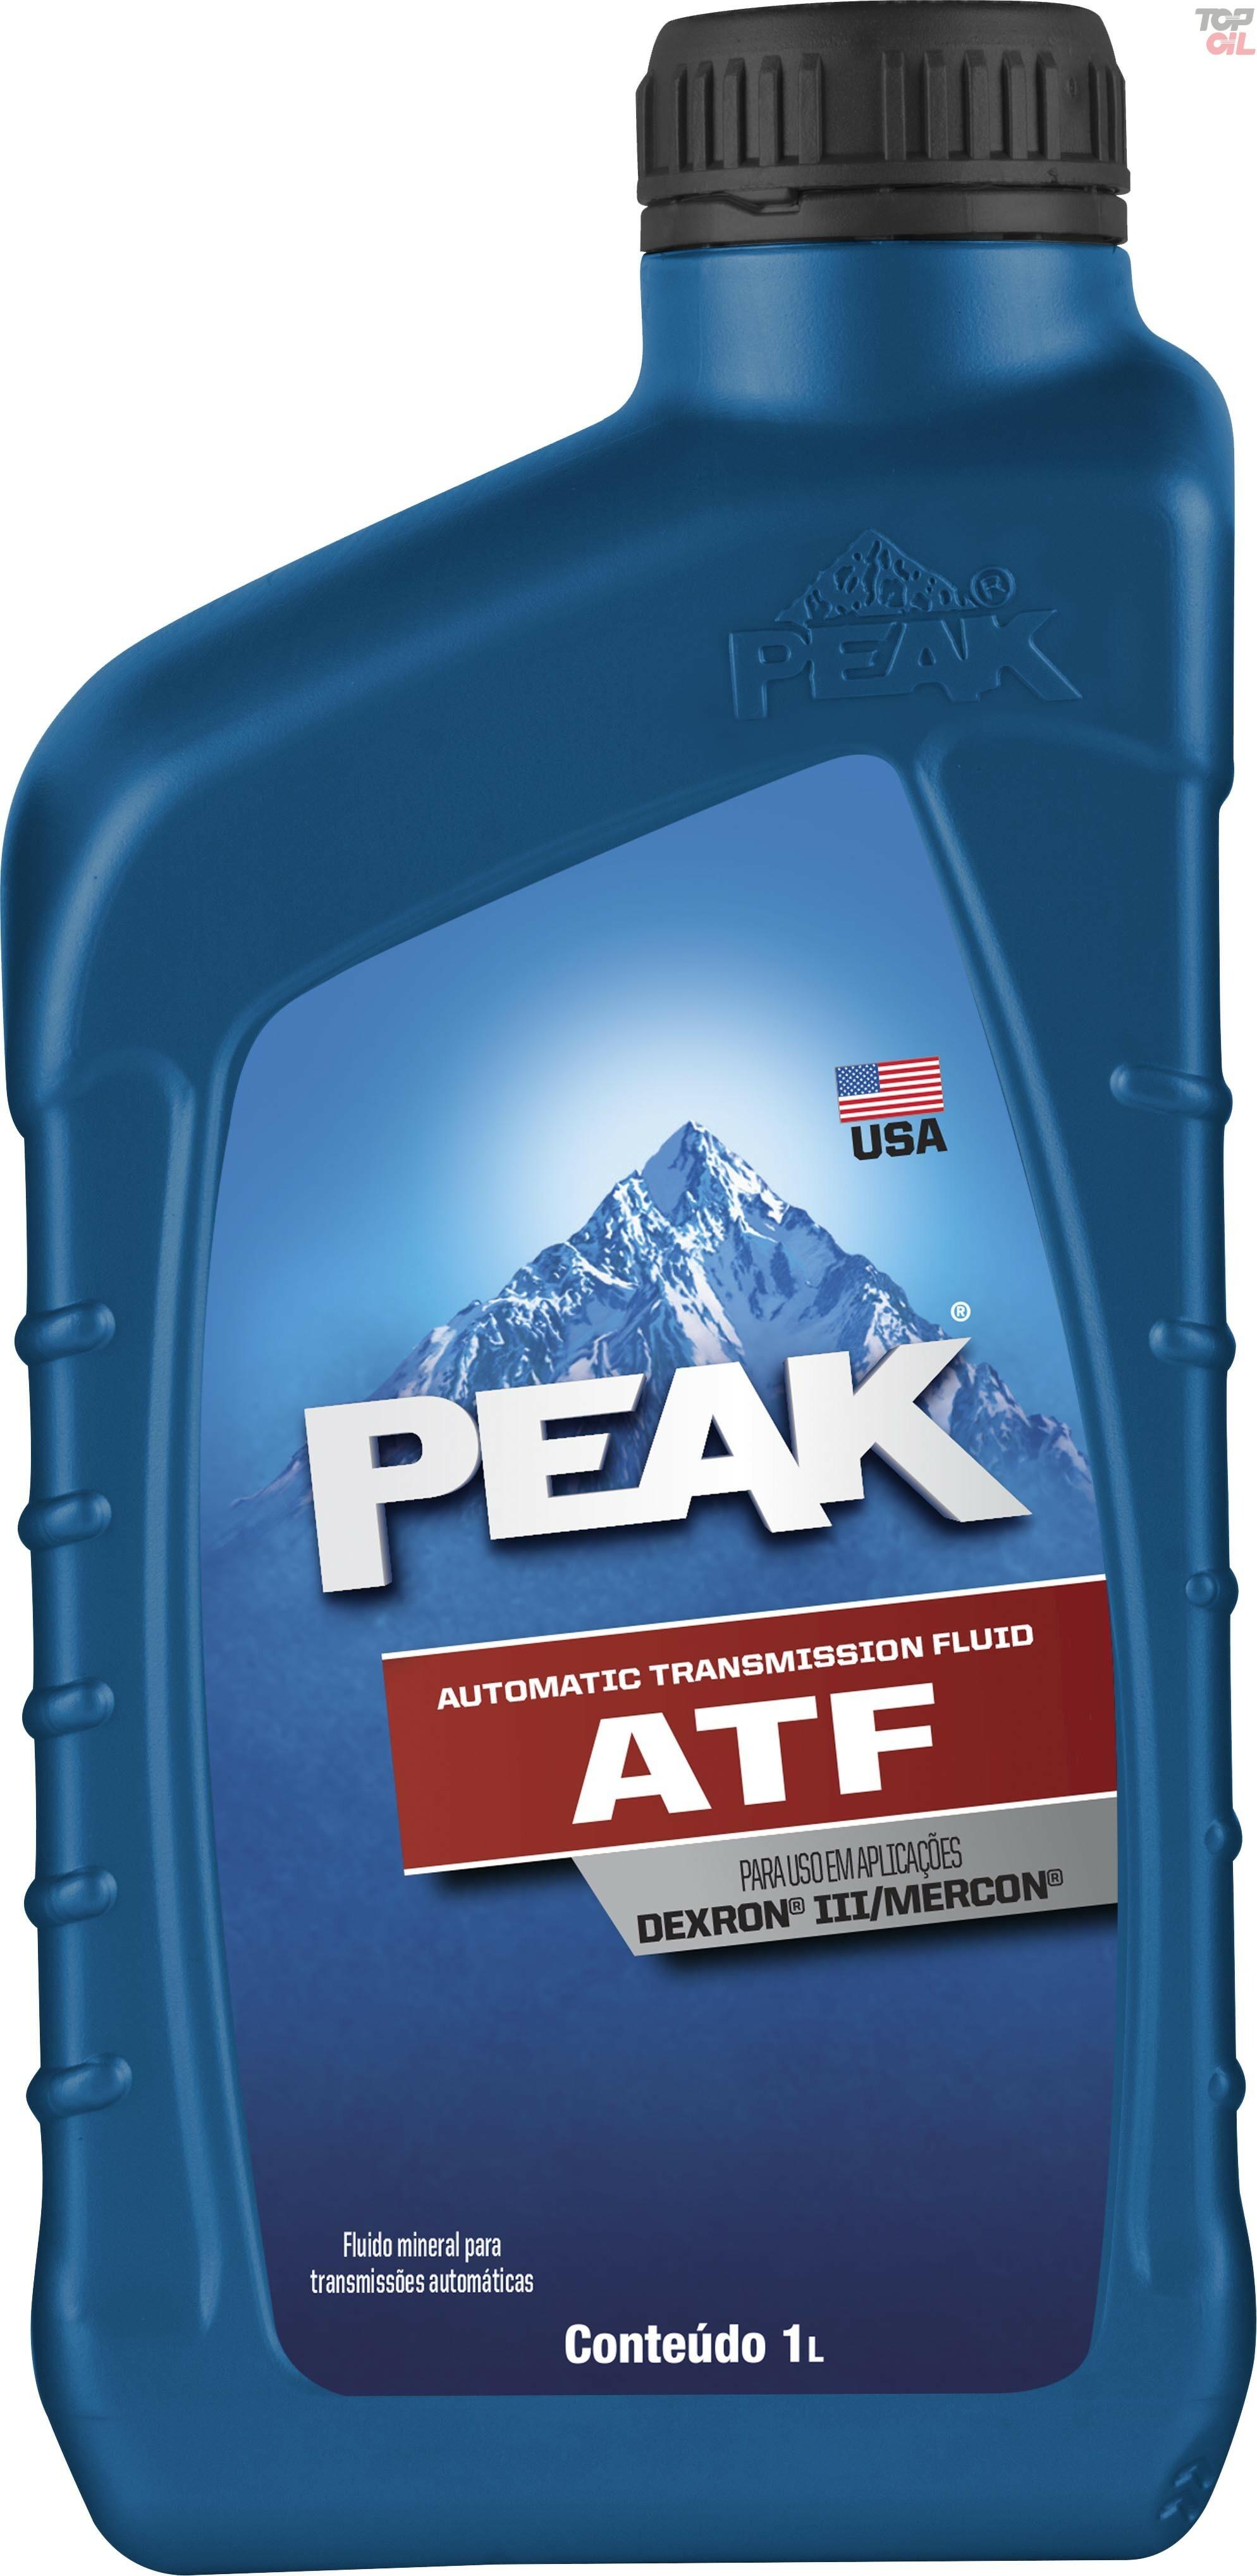 Oleo de Cambio  Peak ATF DEXRON III/MERCON (MINERAL) - 1 litro